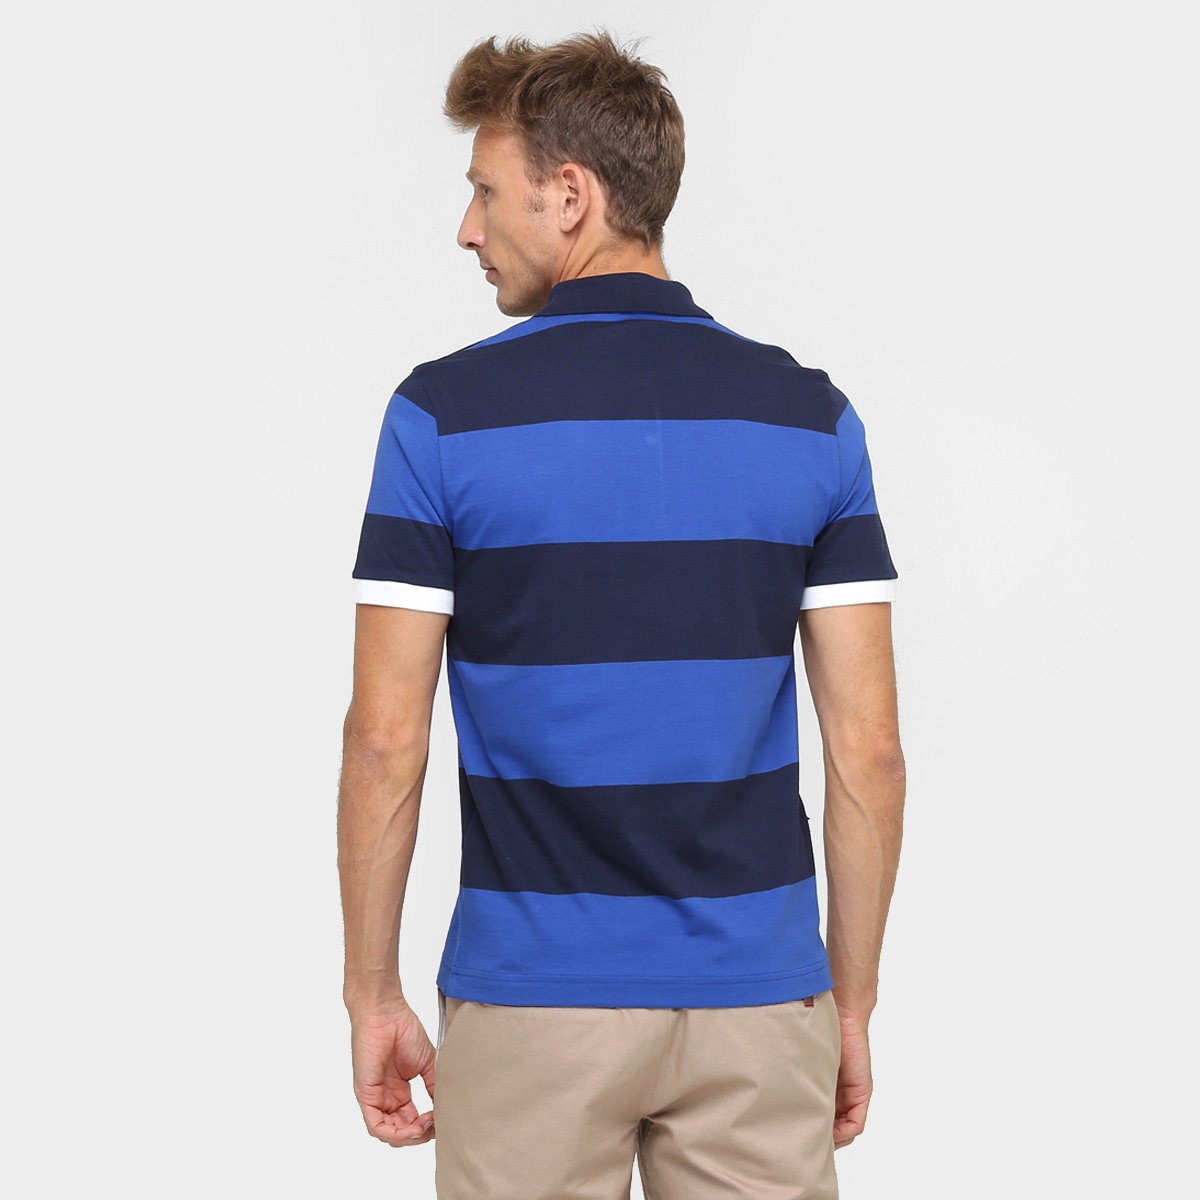 Camisa Polo Lacoste Live Listrada Piquet - Compre Agora   Zattini ecbeb1e2ae